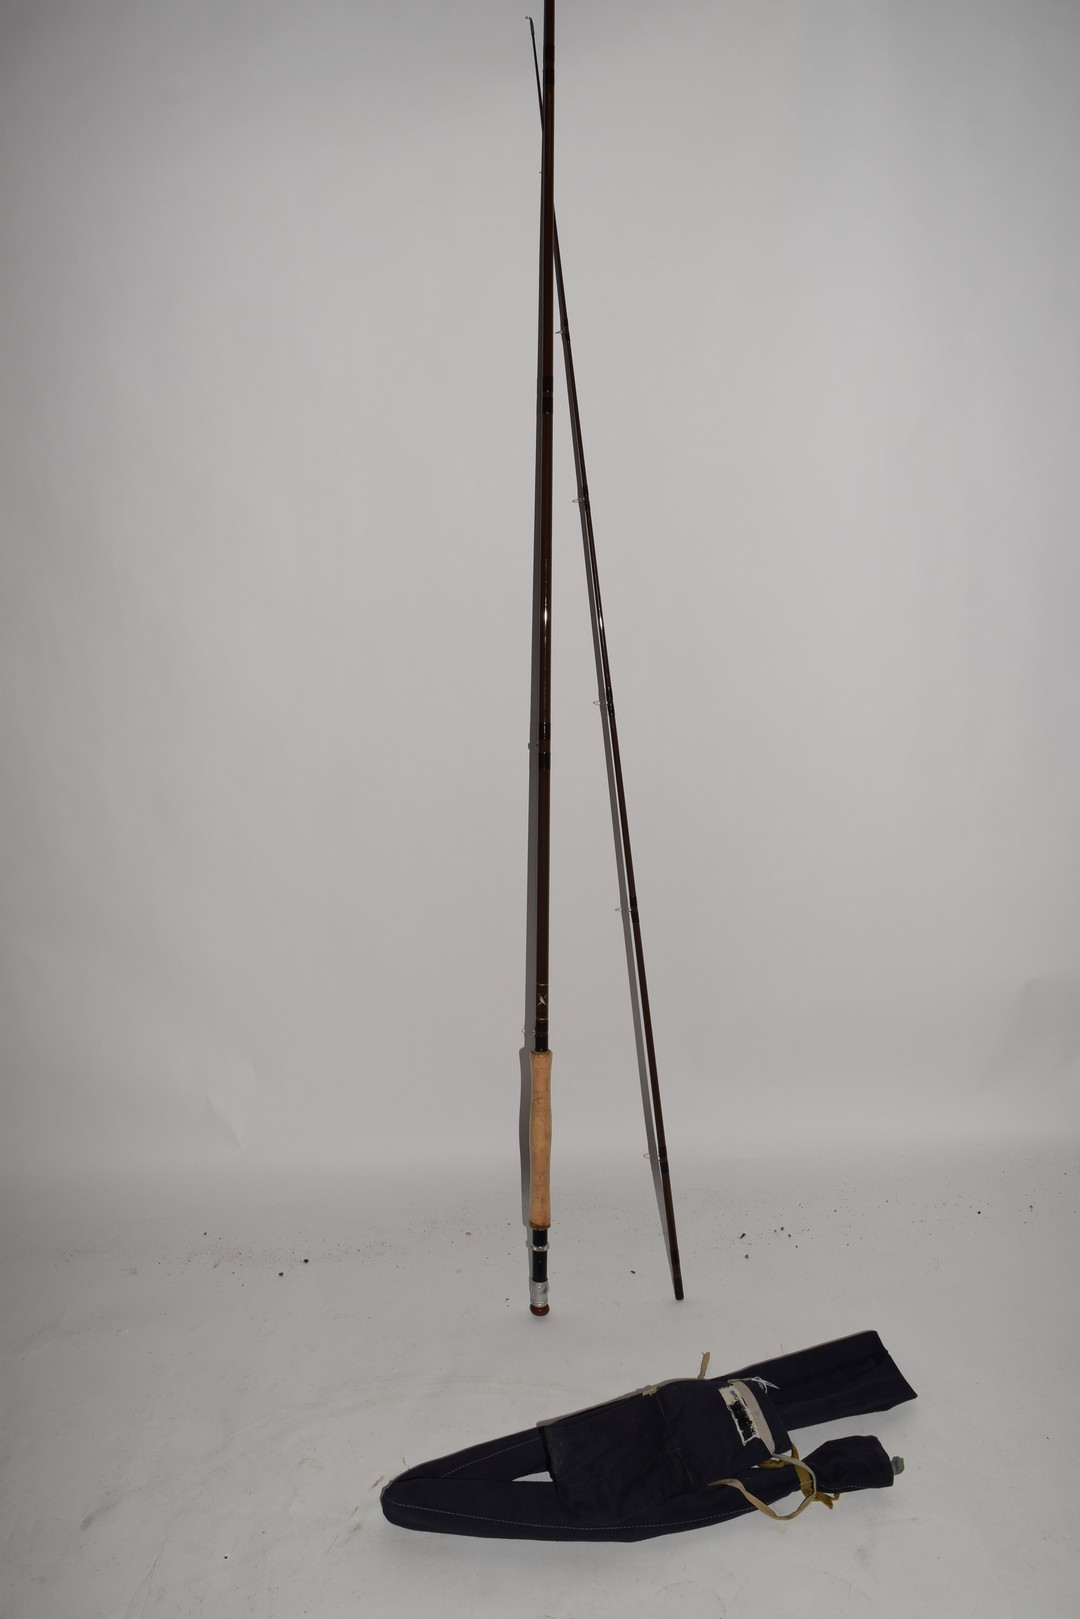 Bruce & Walker, England, vintage fly fishing rod 'The Loch'